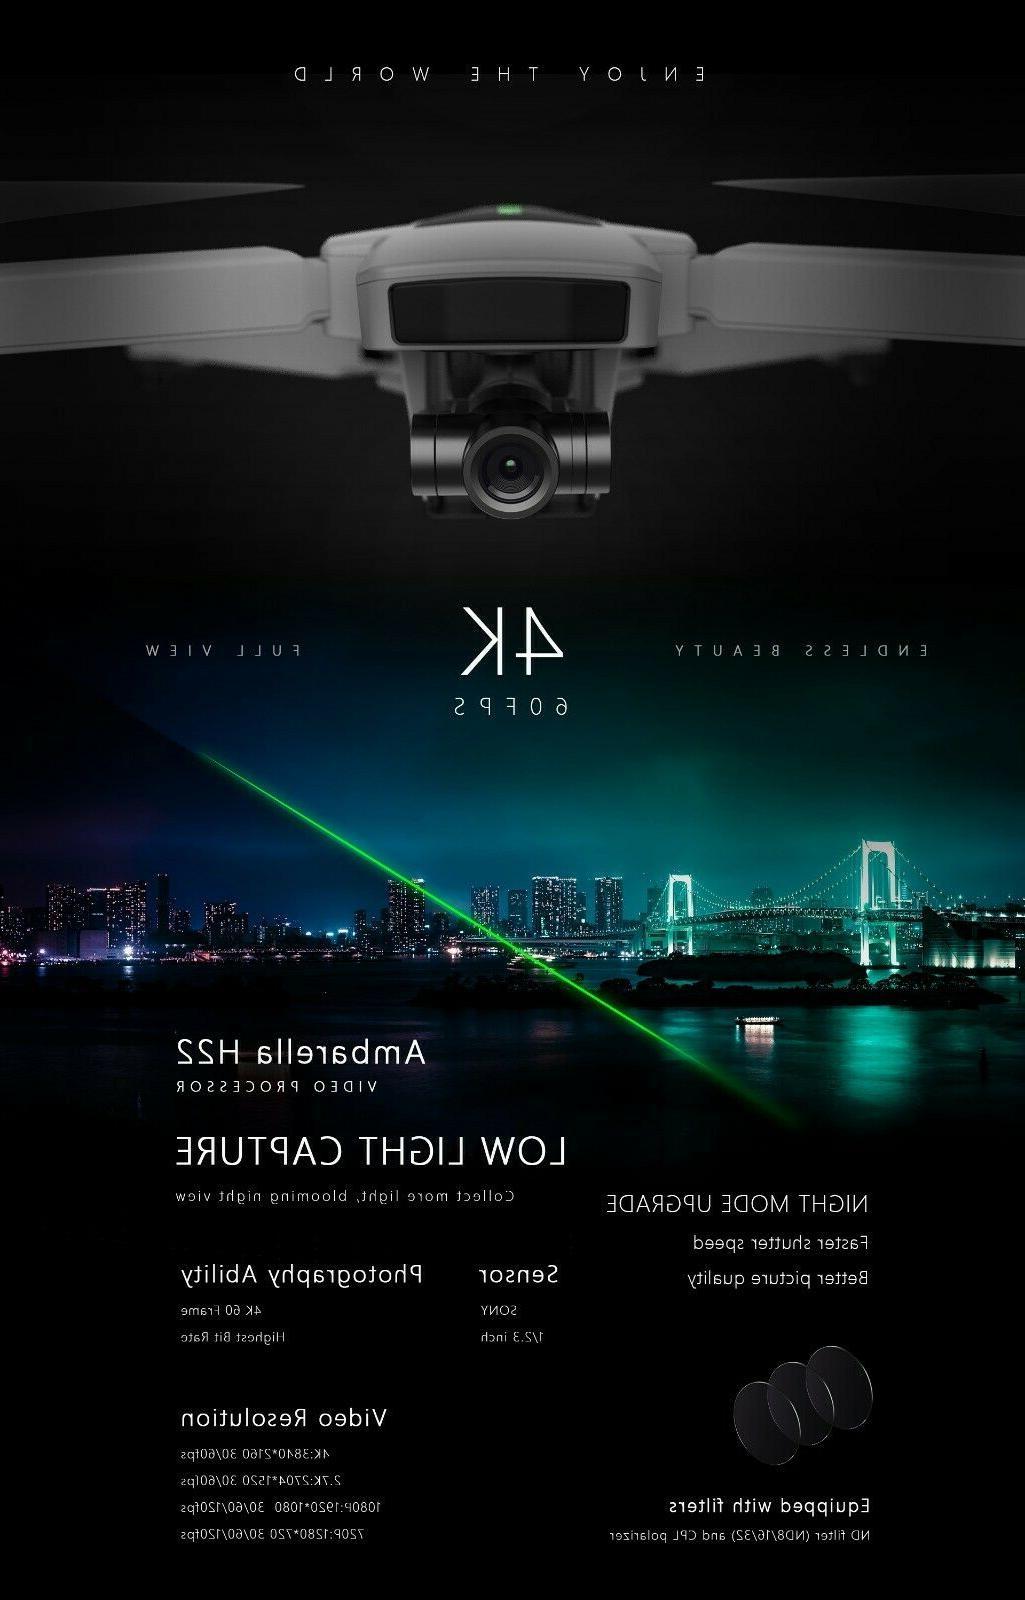 Hubsan Zino 2+ Drone GPS Pre-Order 9KM with 3-axis Gimbal